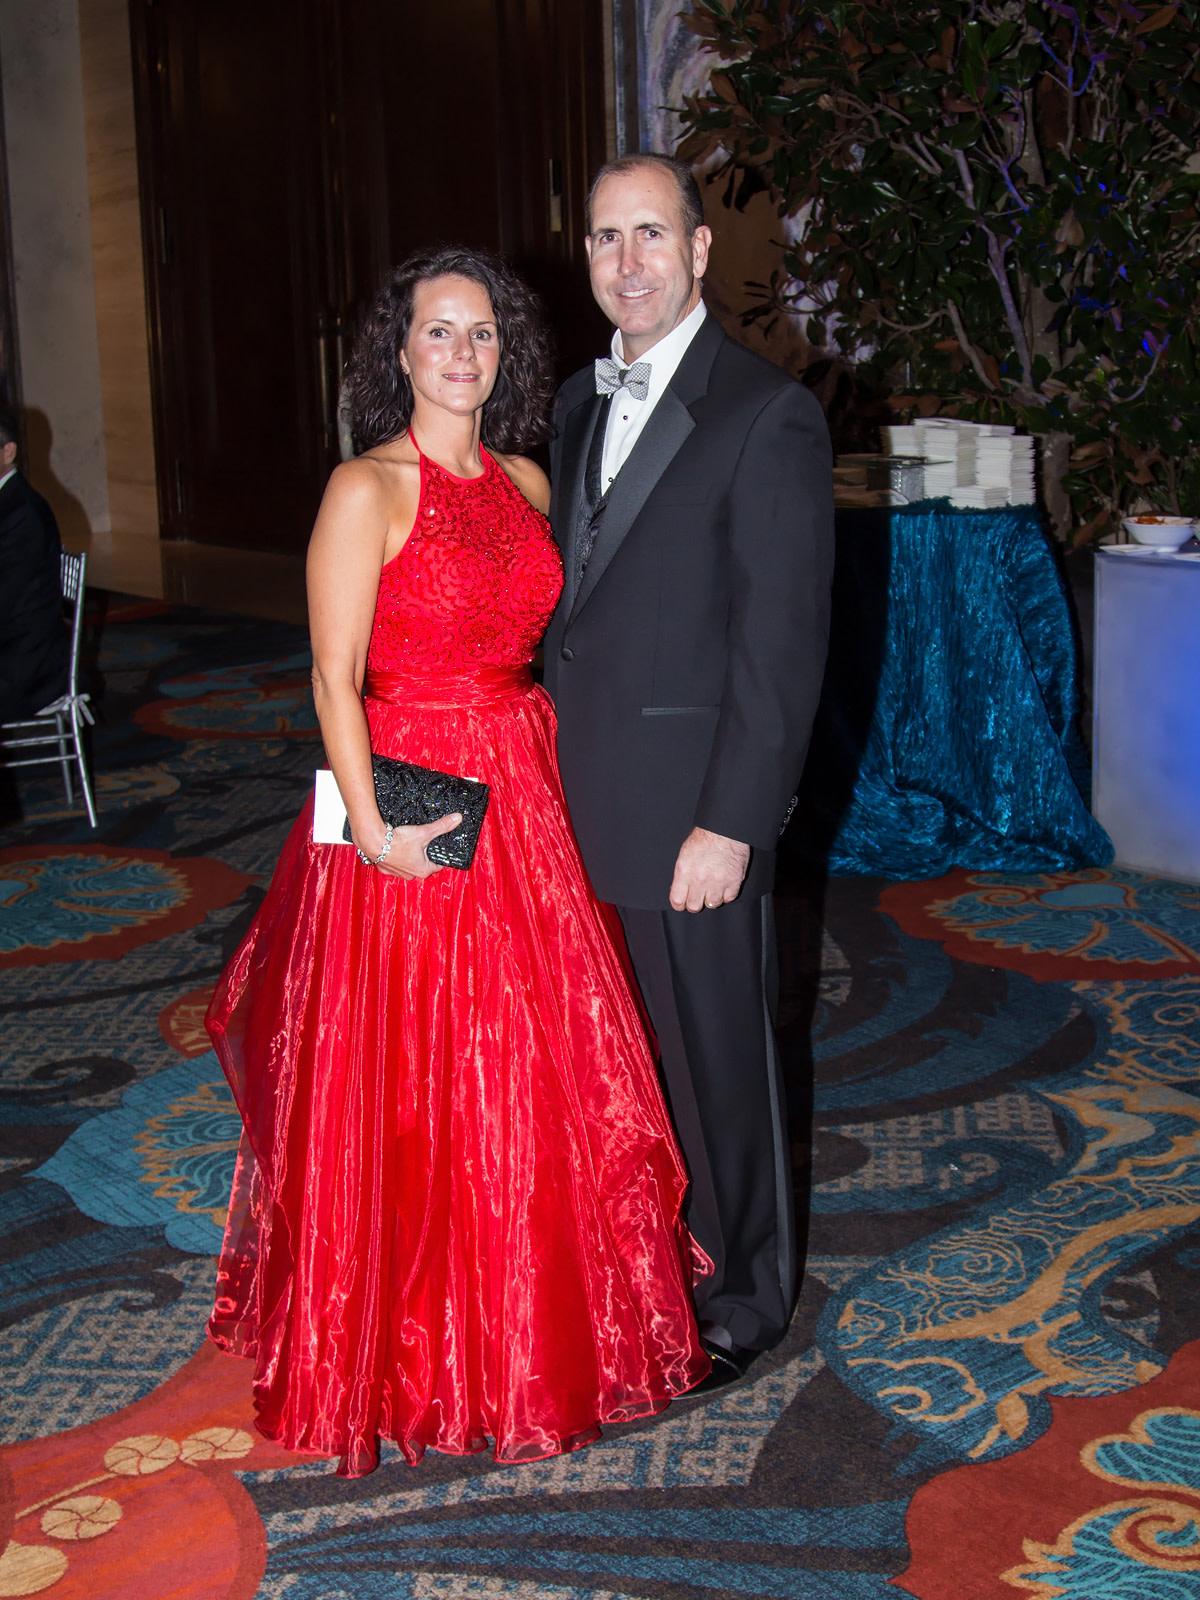 Jennifer Lawson, Dave Lawson